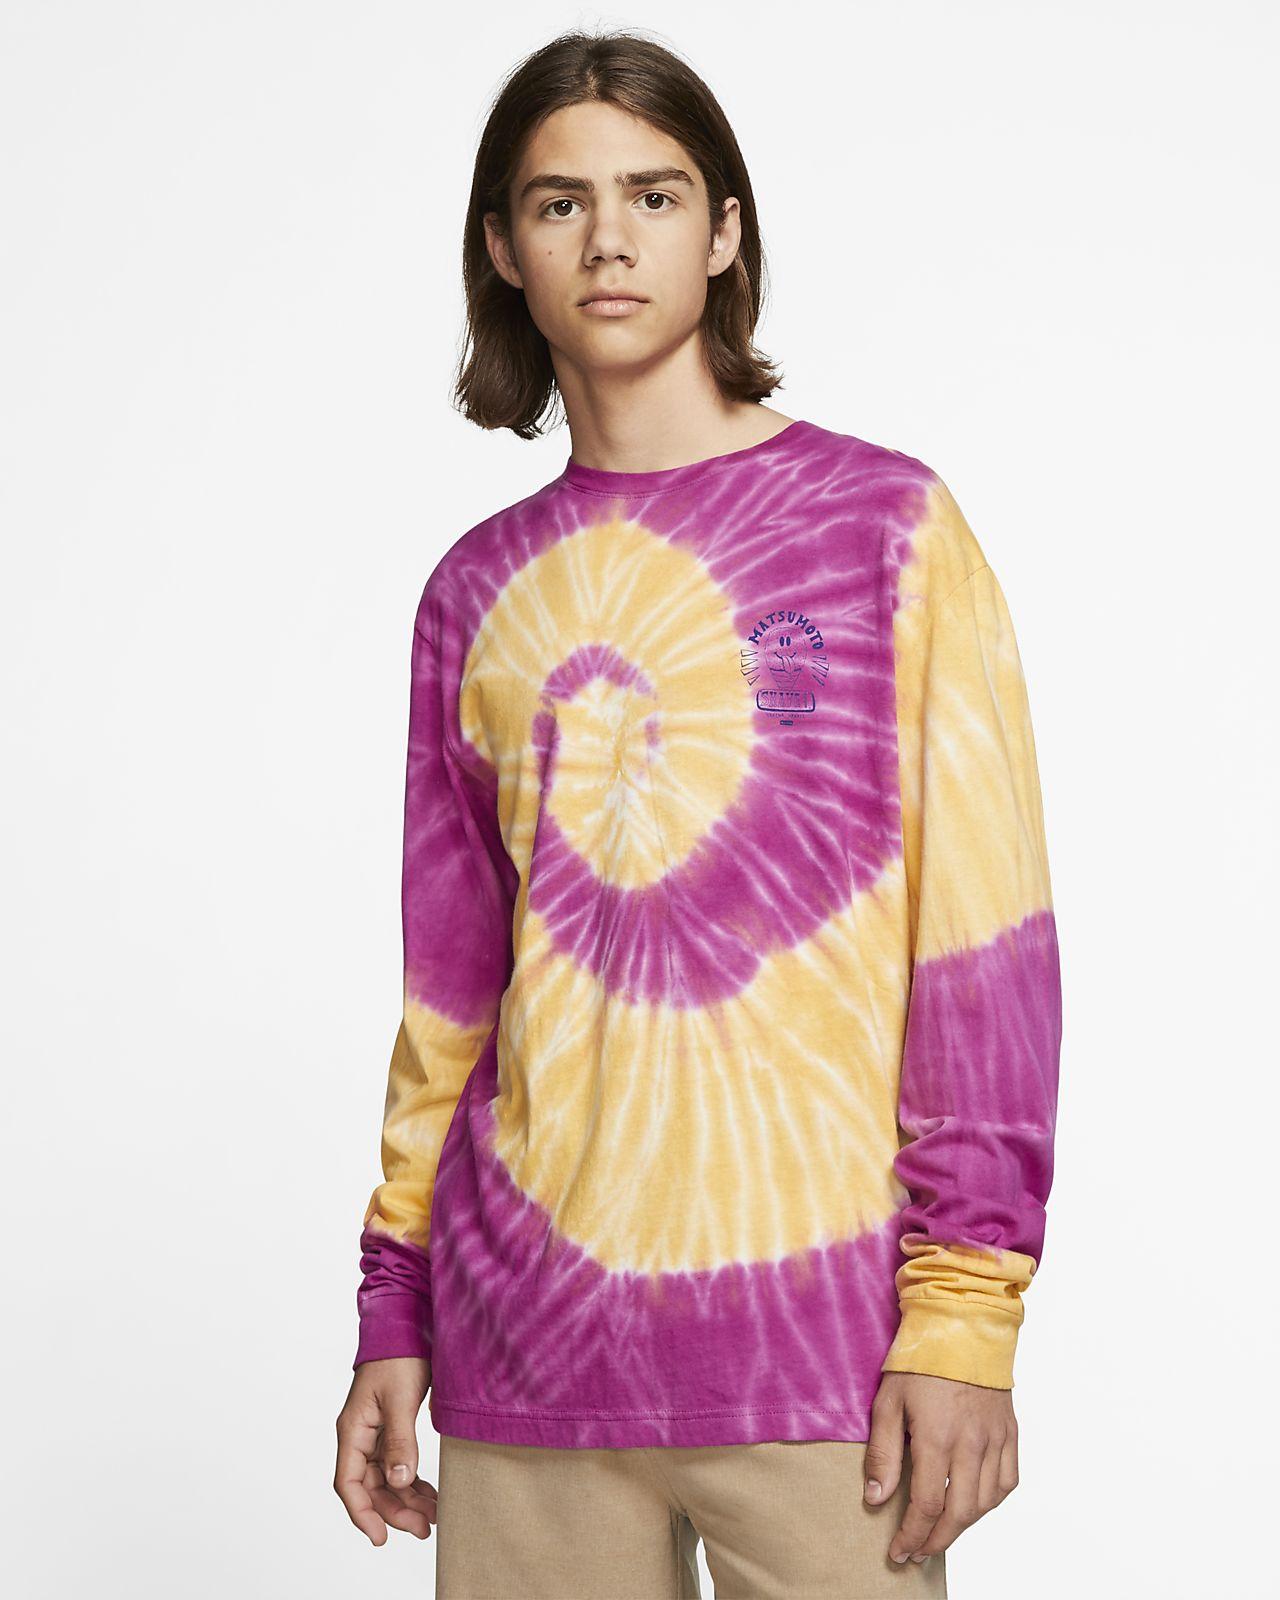 Hurley x Matsumoto Shave Ice Tie Dye T skjorte til herre